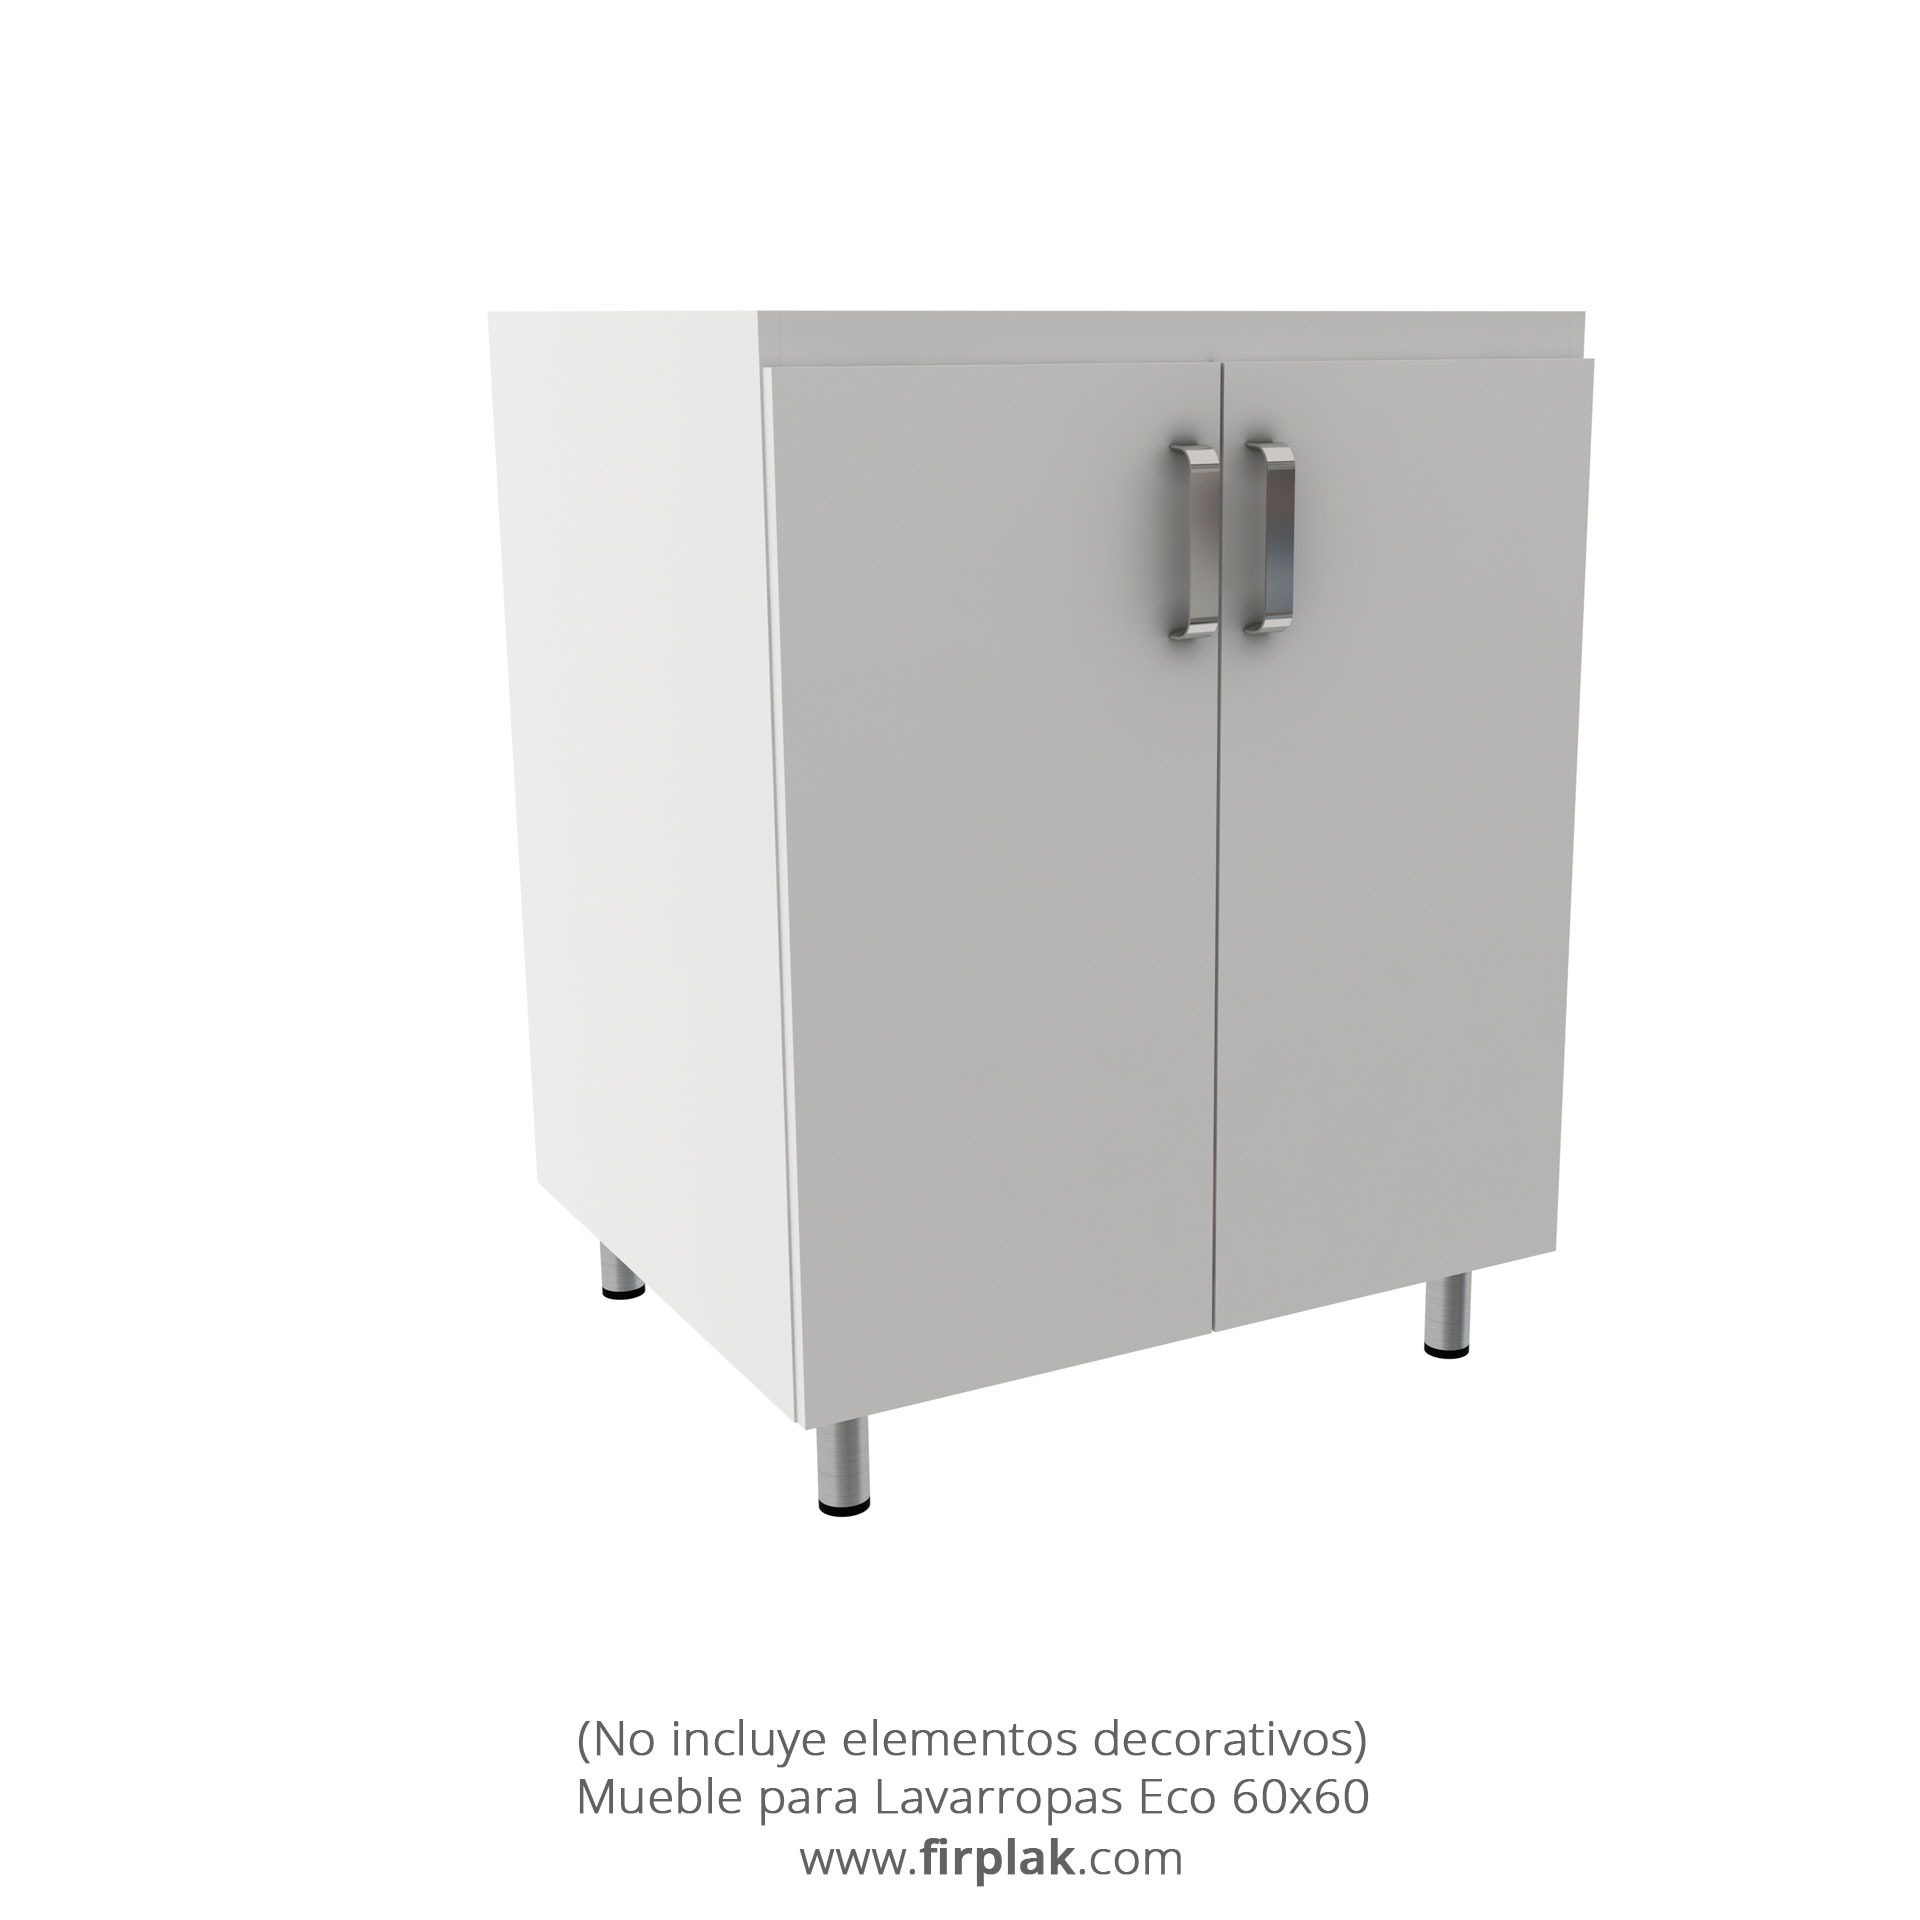 mueble para lavarropas eco 60 60 2 firplak